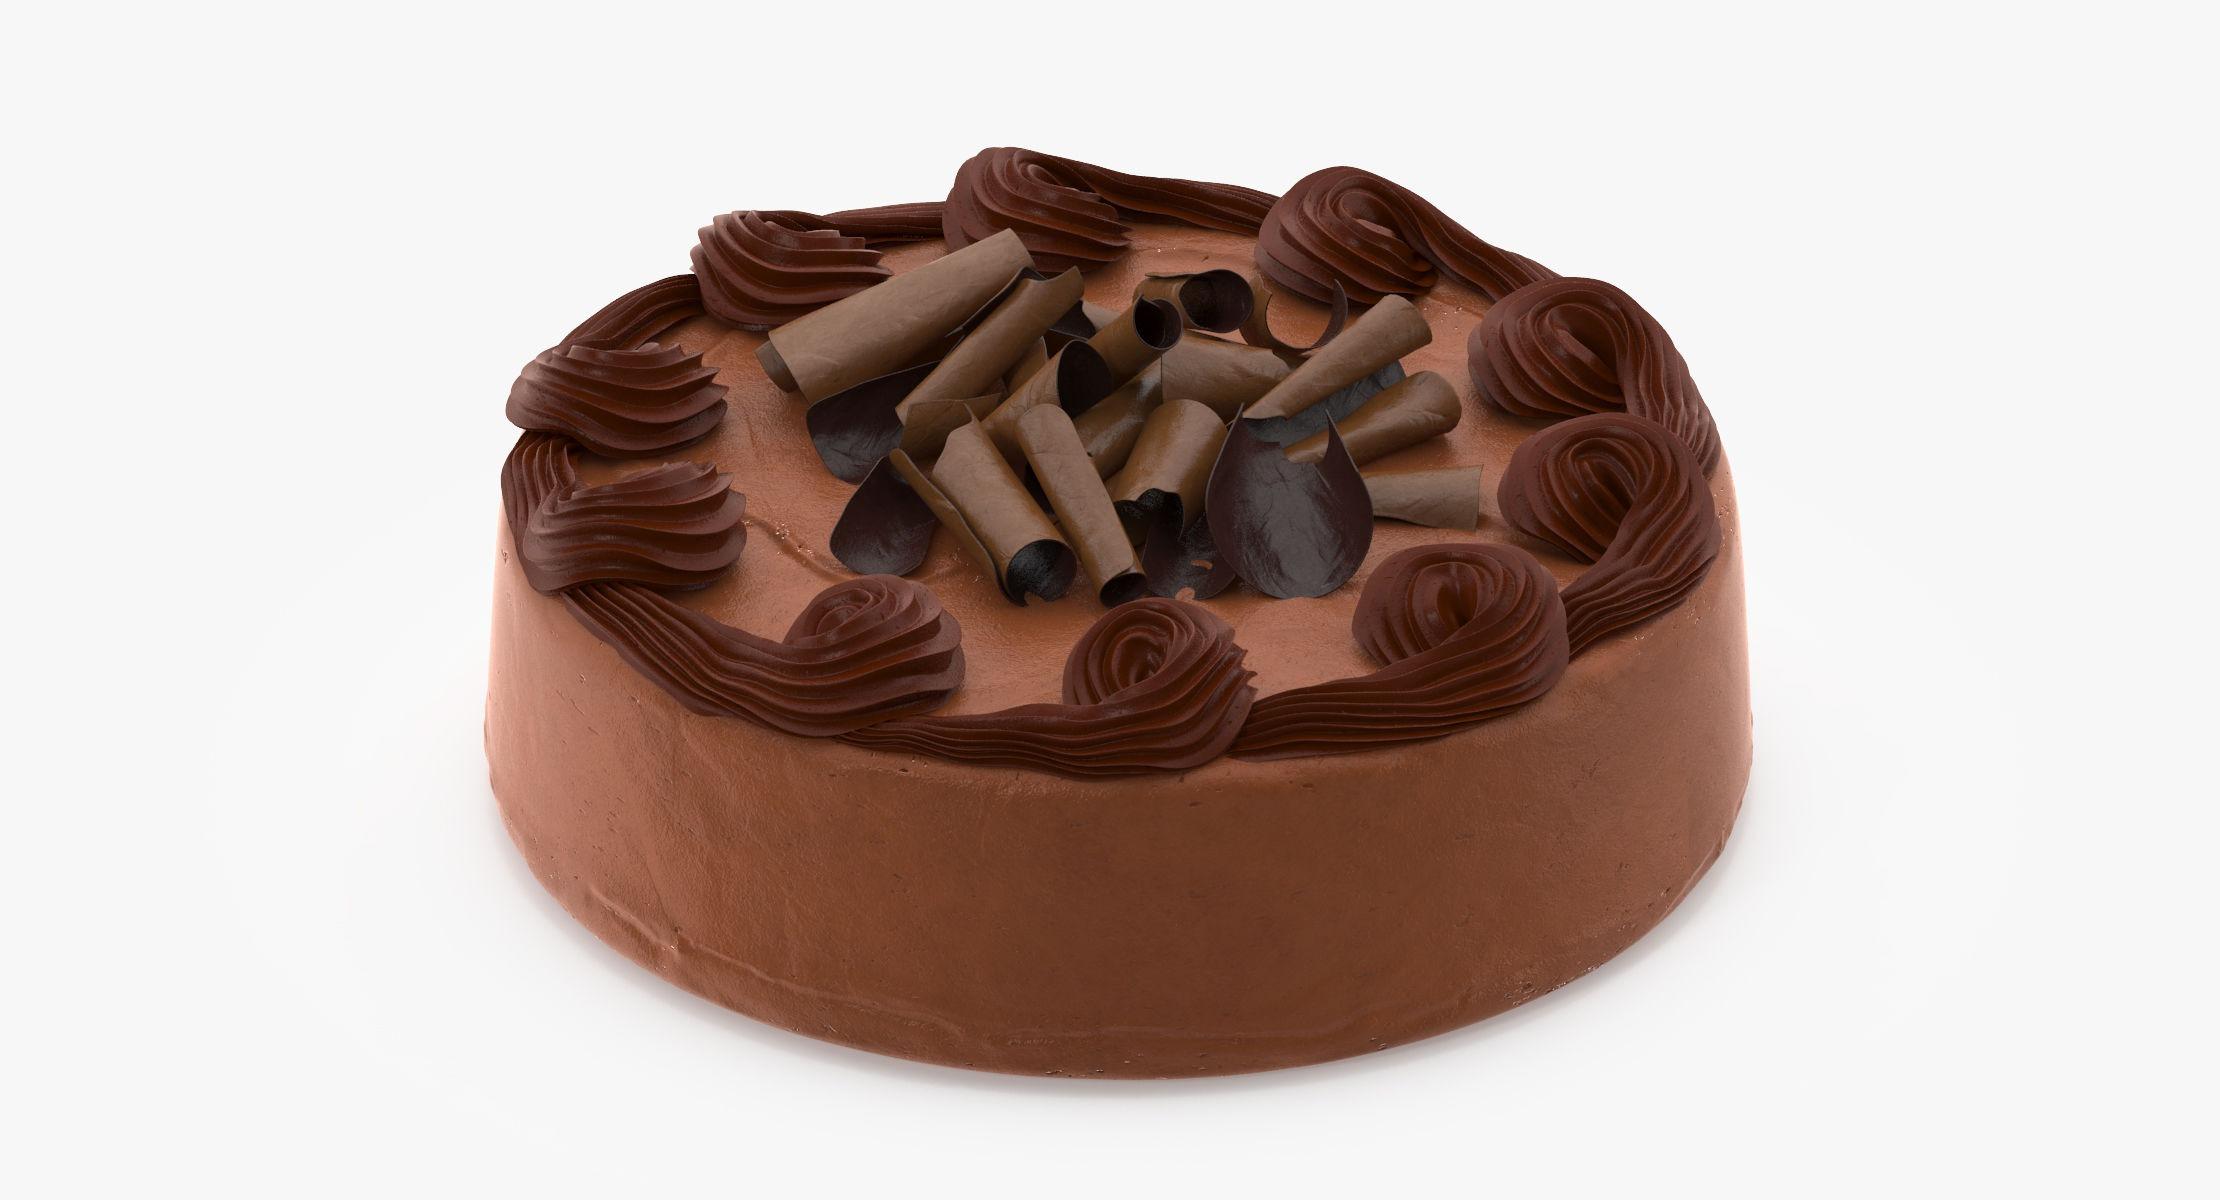 Cake 04 - reel 1